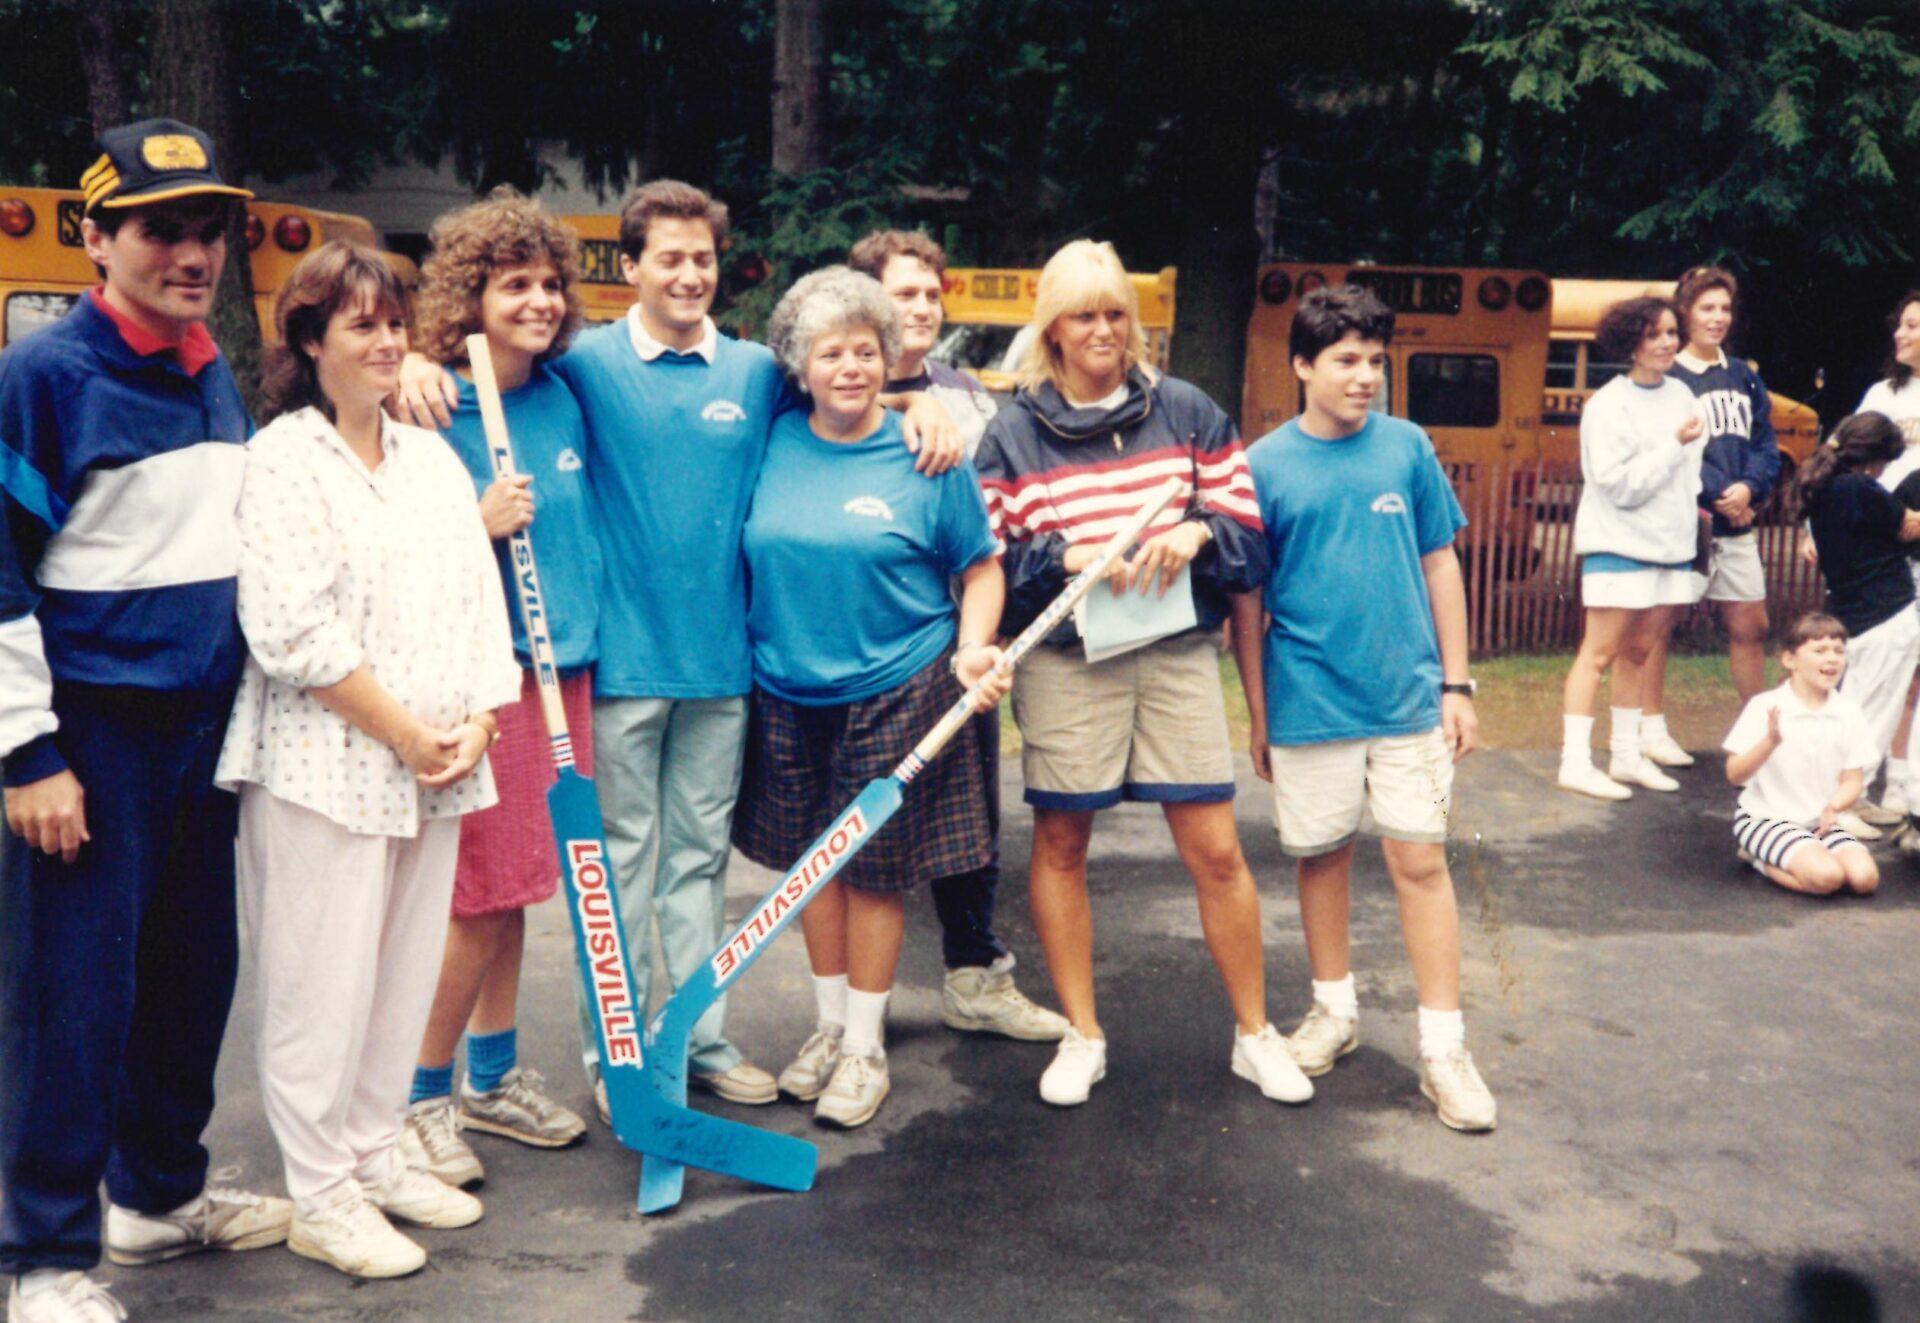 Camp staff posing with hockey sticks.